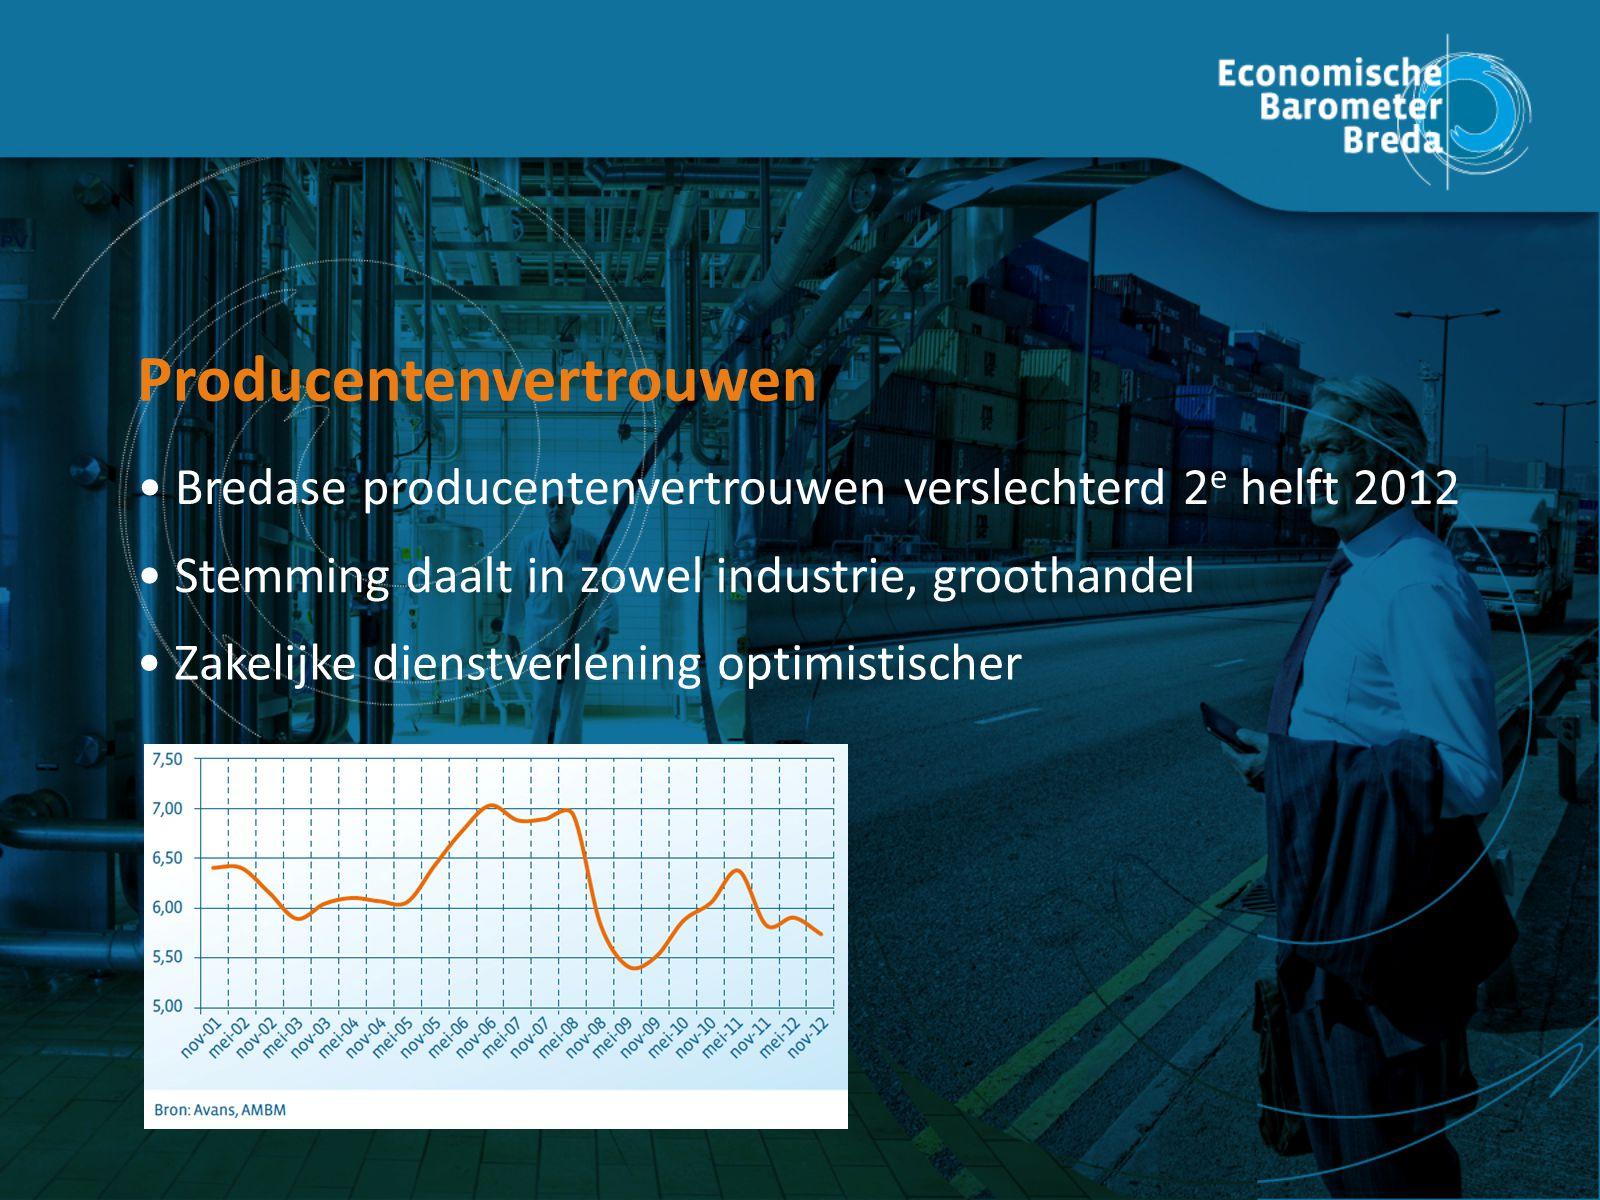 Producenten vertrouwen Bredase producentenvertrouwen verslechterd 2 e helft 2012 Producentenvertrouwen Stemming daalt in zowel industrie, groothandel Zakelijke dienstverlening optimistischer